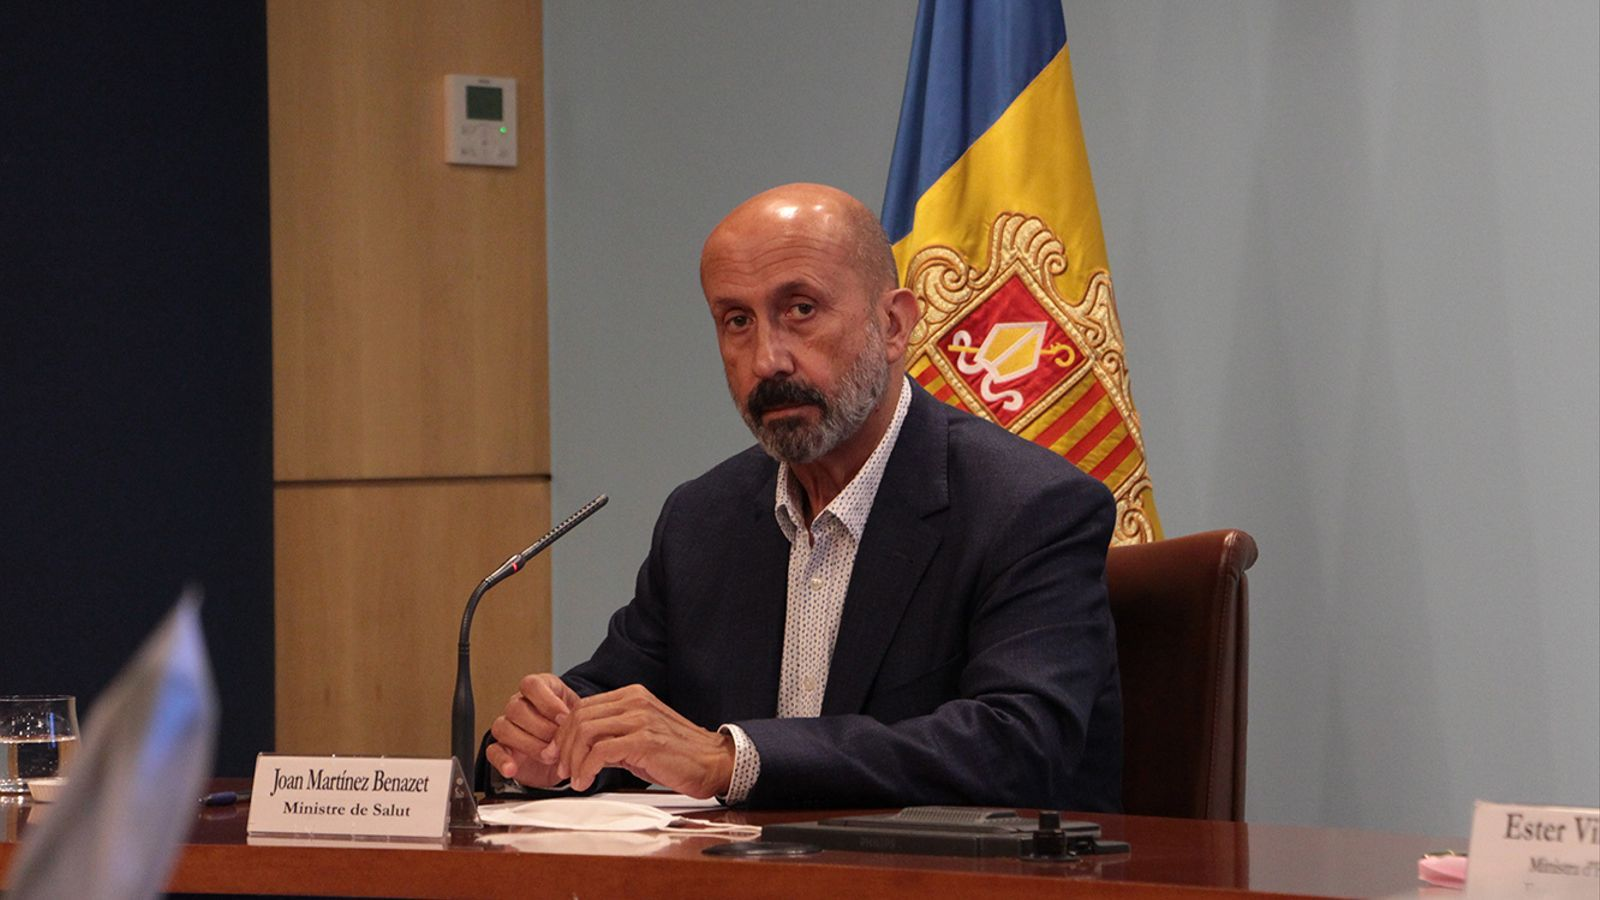 El ministre de Salut, Joan Martínez Benazet. / M. F. (ANA)